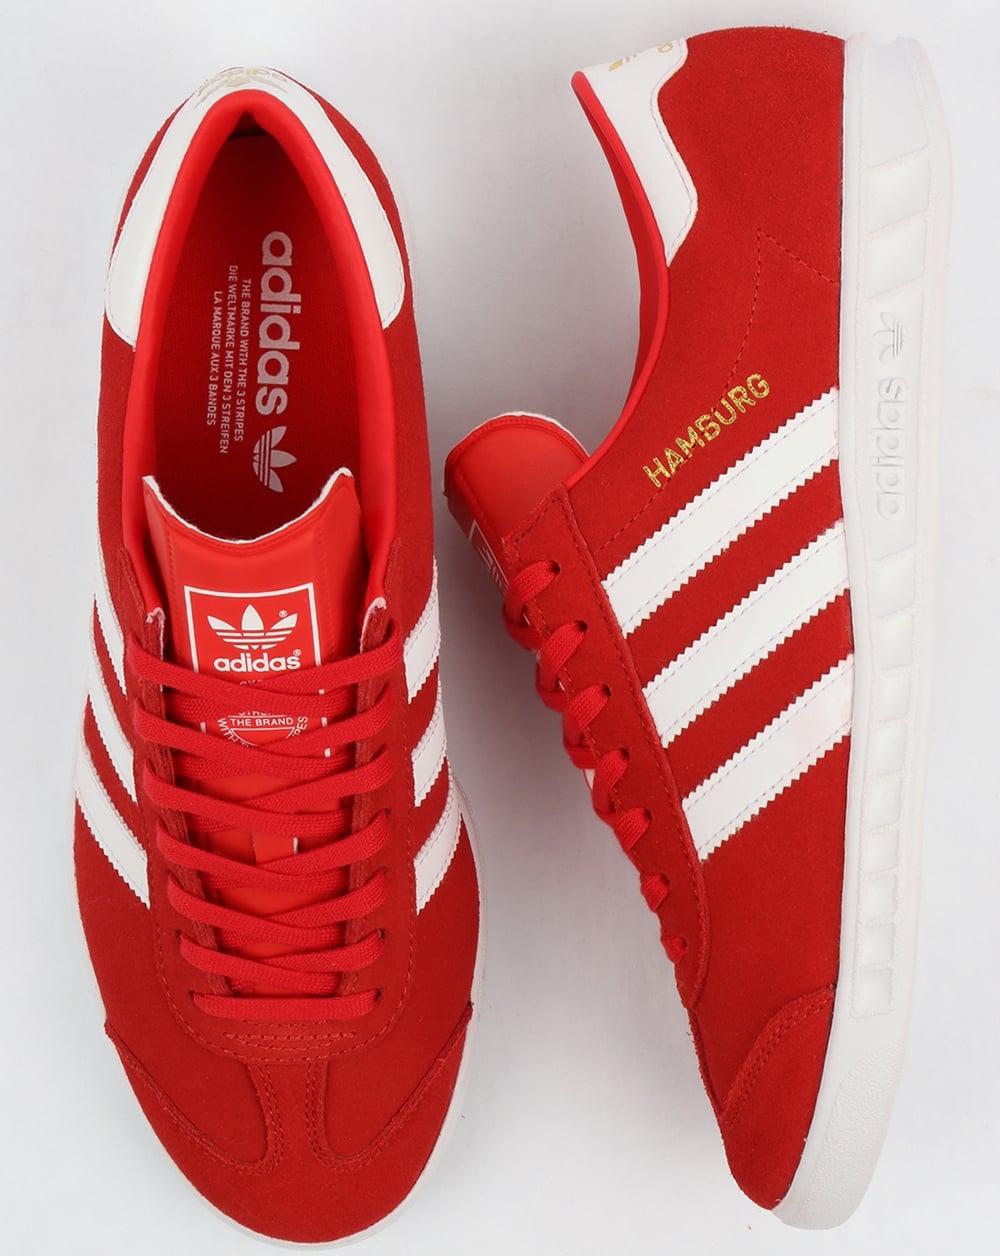 adidas amburgo formatori rosso / bianco, originali, scarpe, mens, scarpe da ginnastica